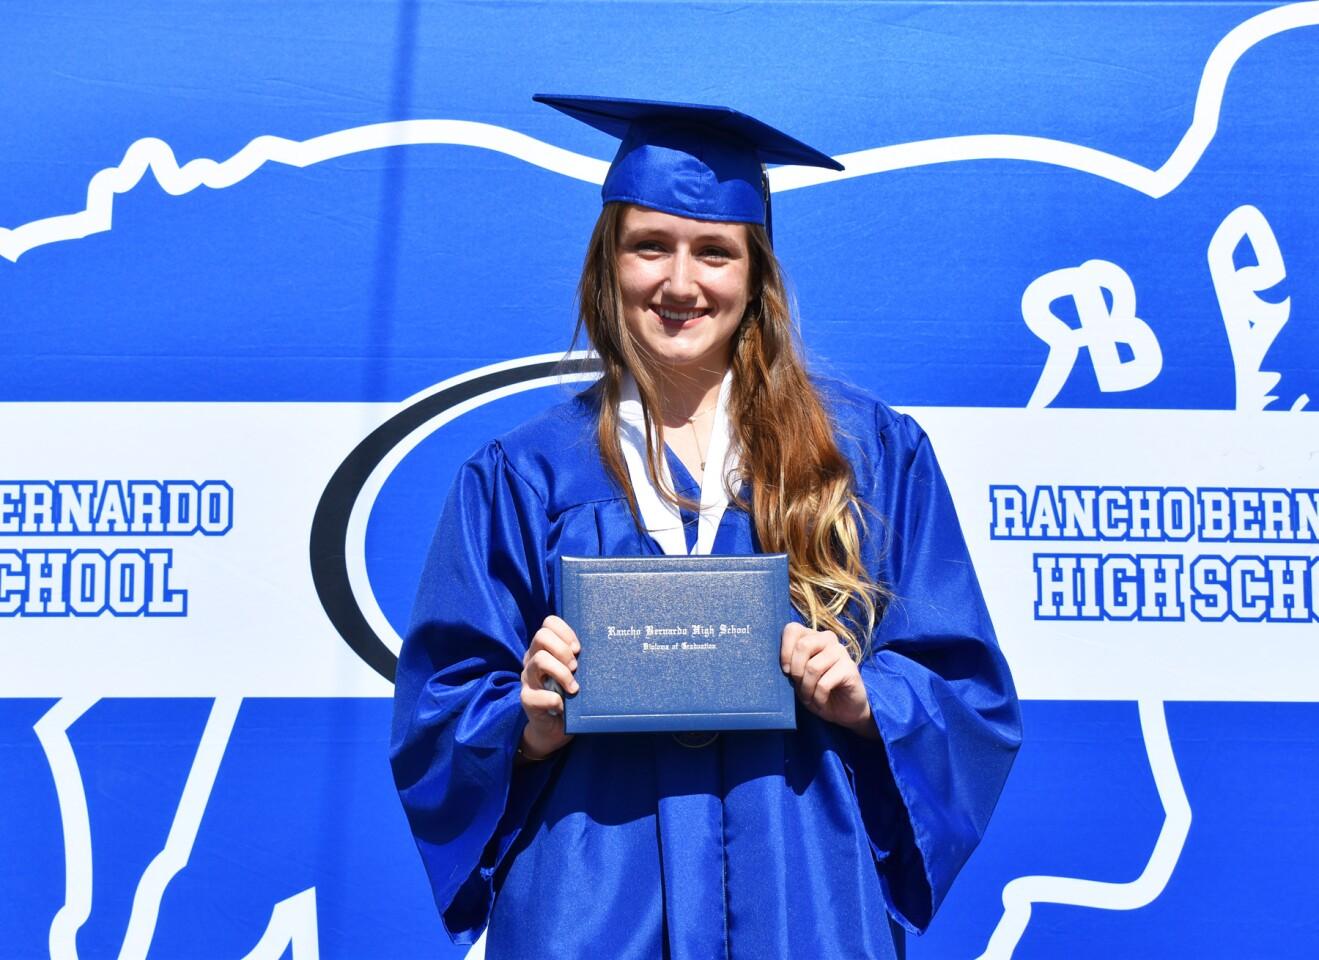 RBHS graduate Danielle Sileo